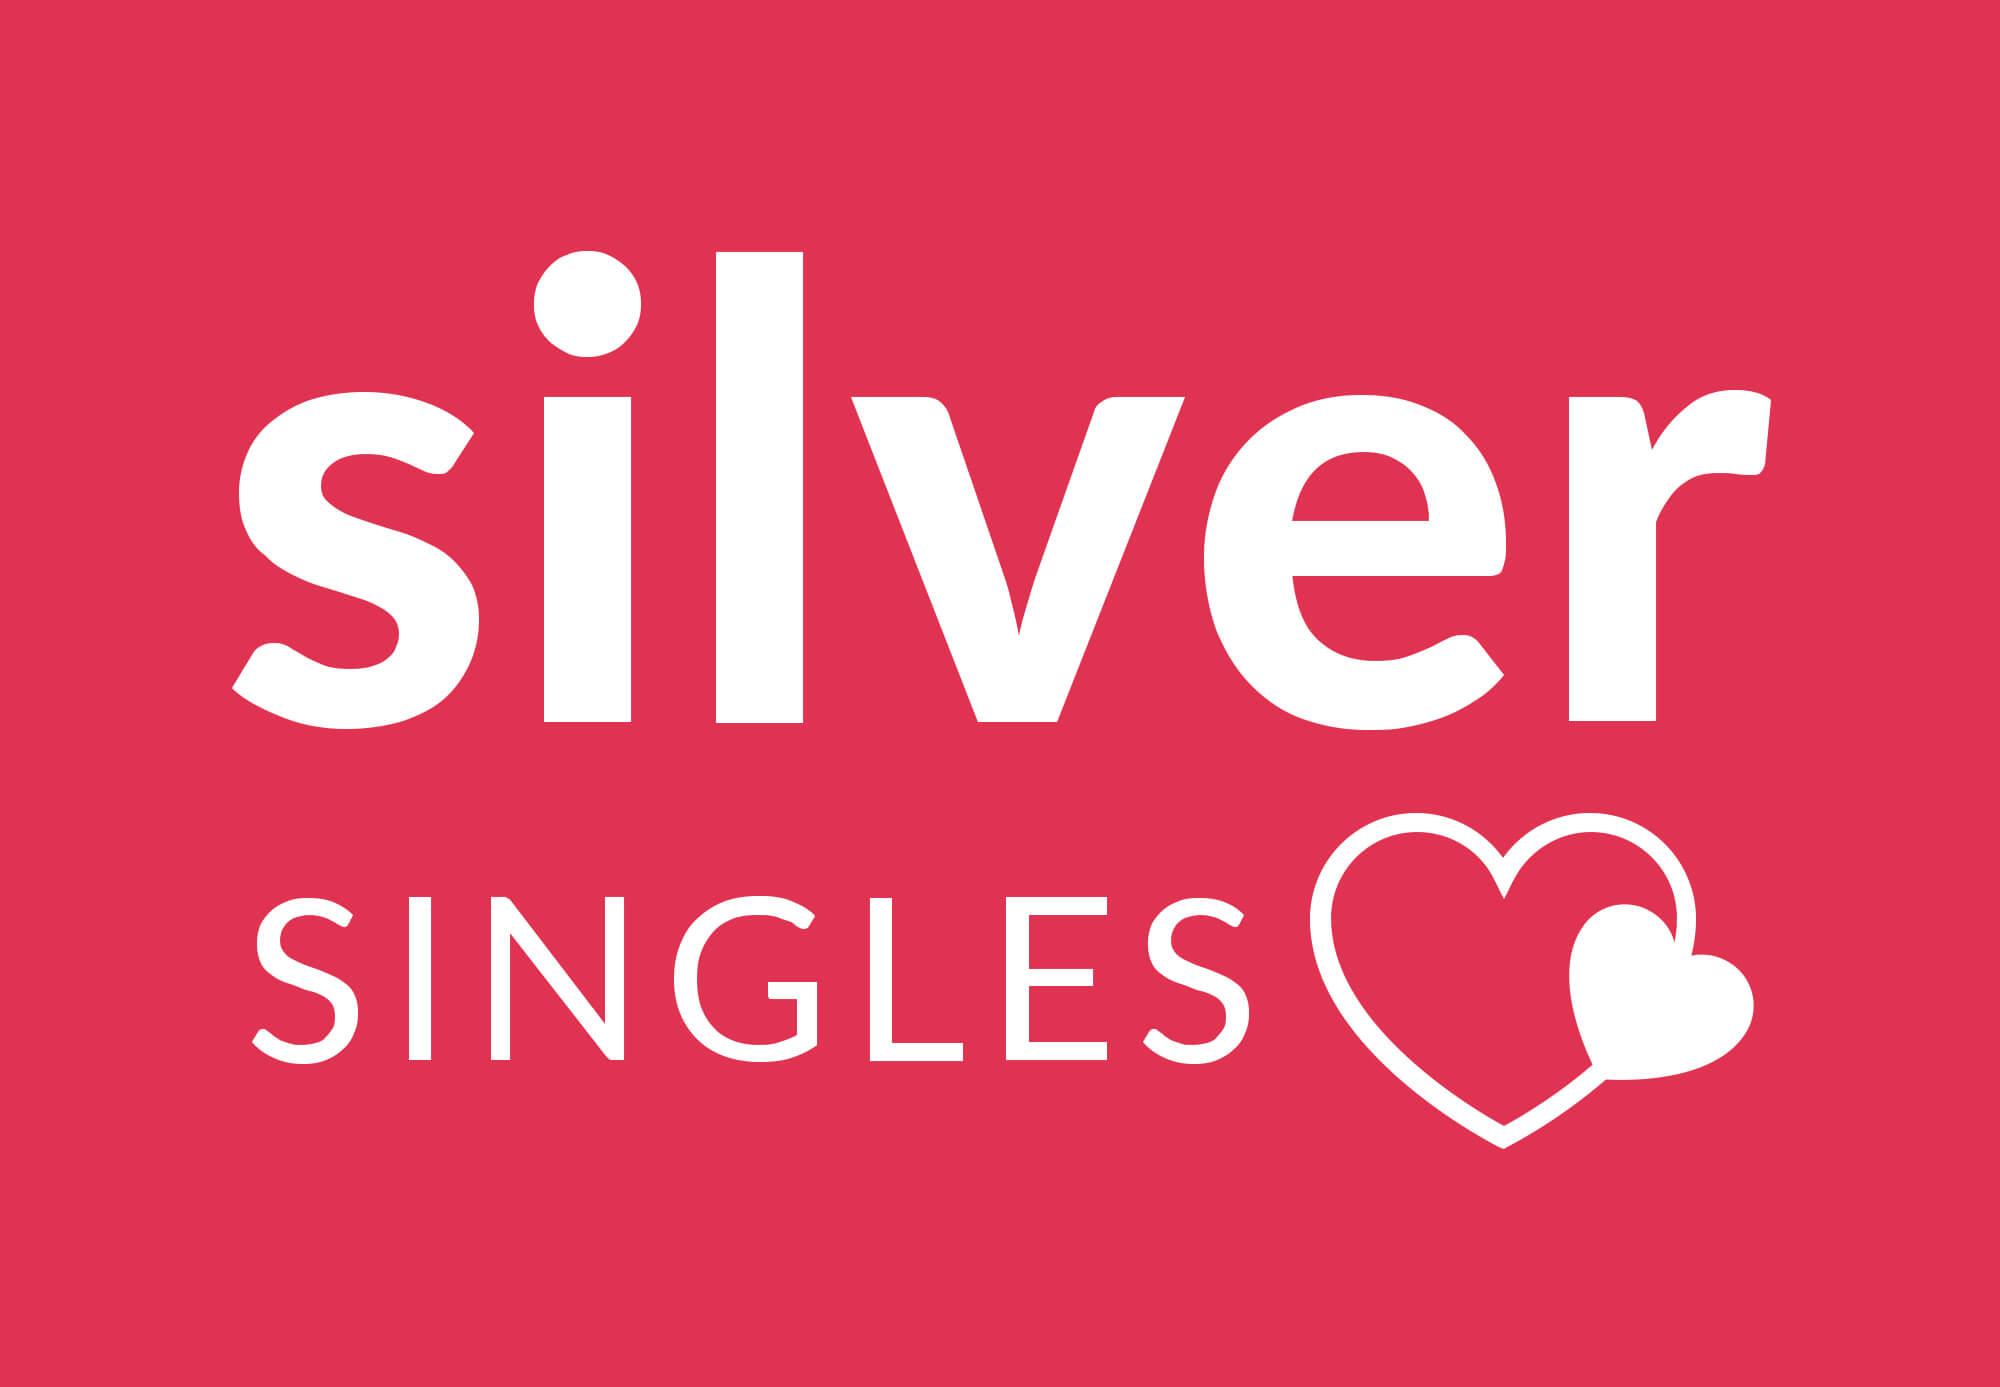 silversingles logo - Best Senior Dating Sites: Love Knows No Age